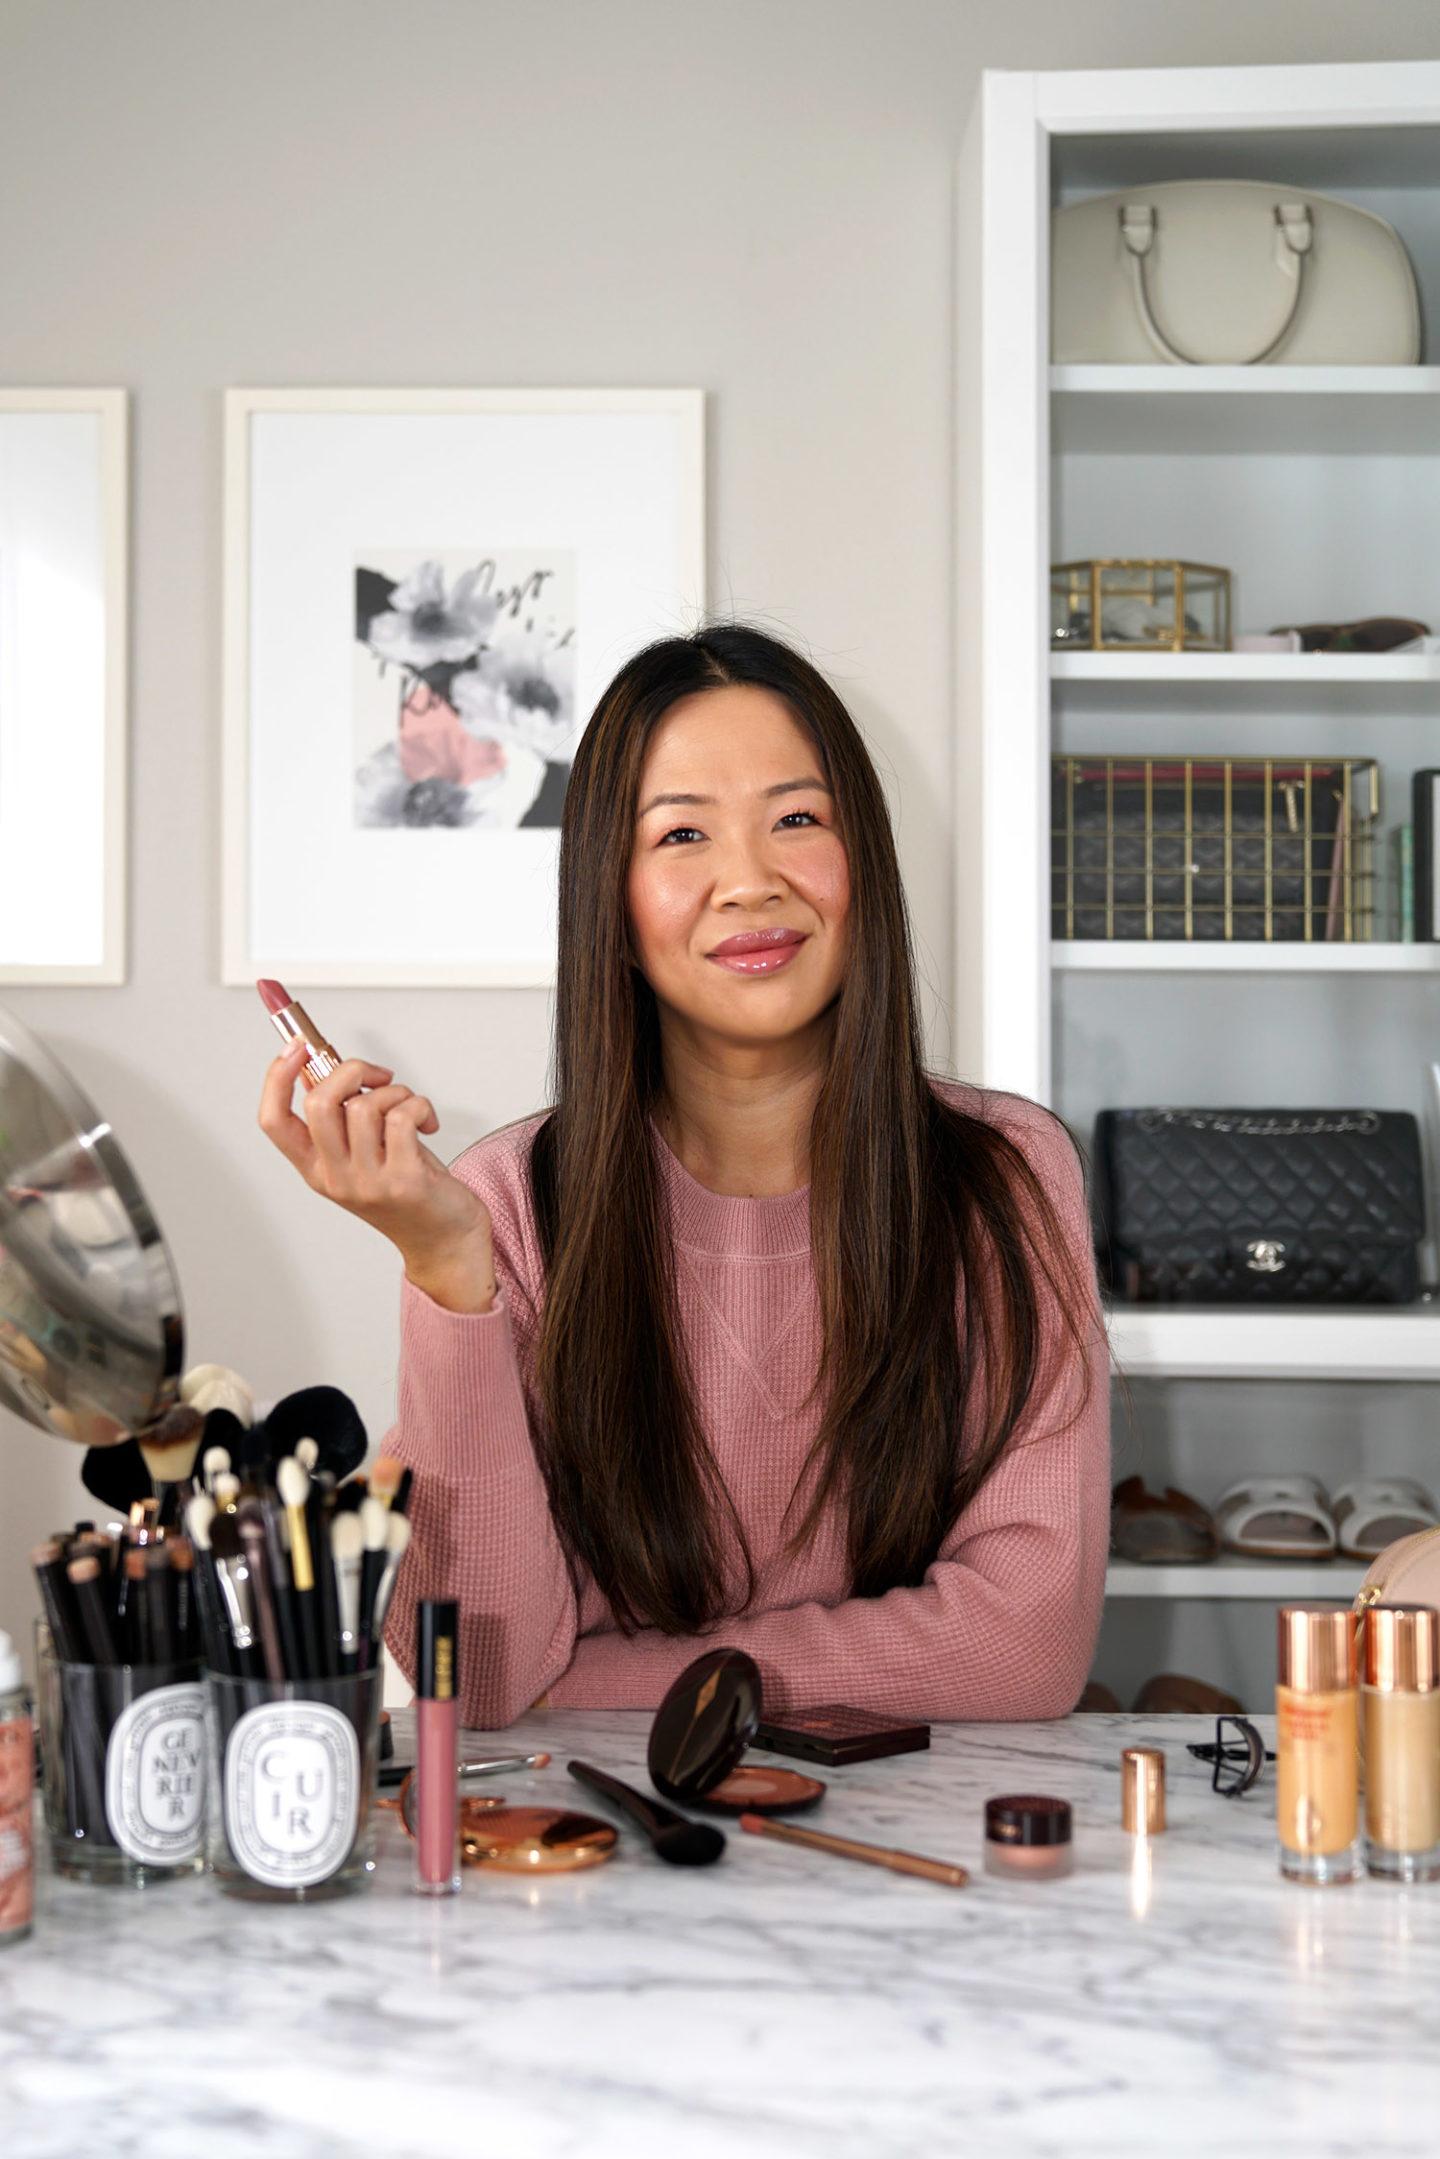 Charlotte Tilbury - Look de maquillage d'oreiller